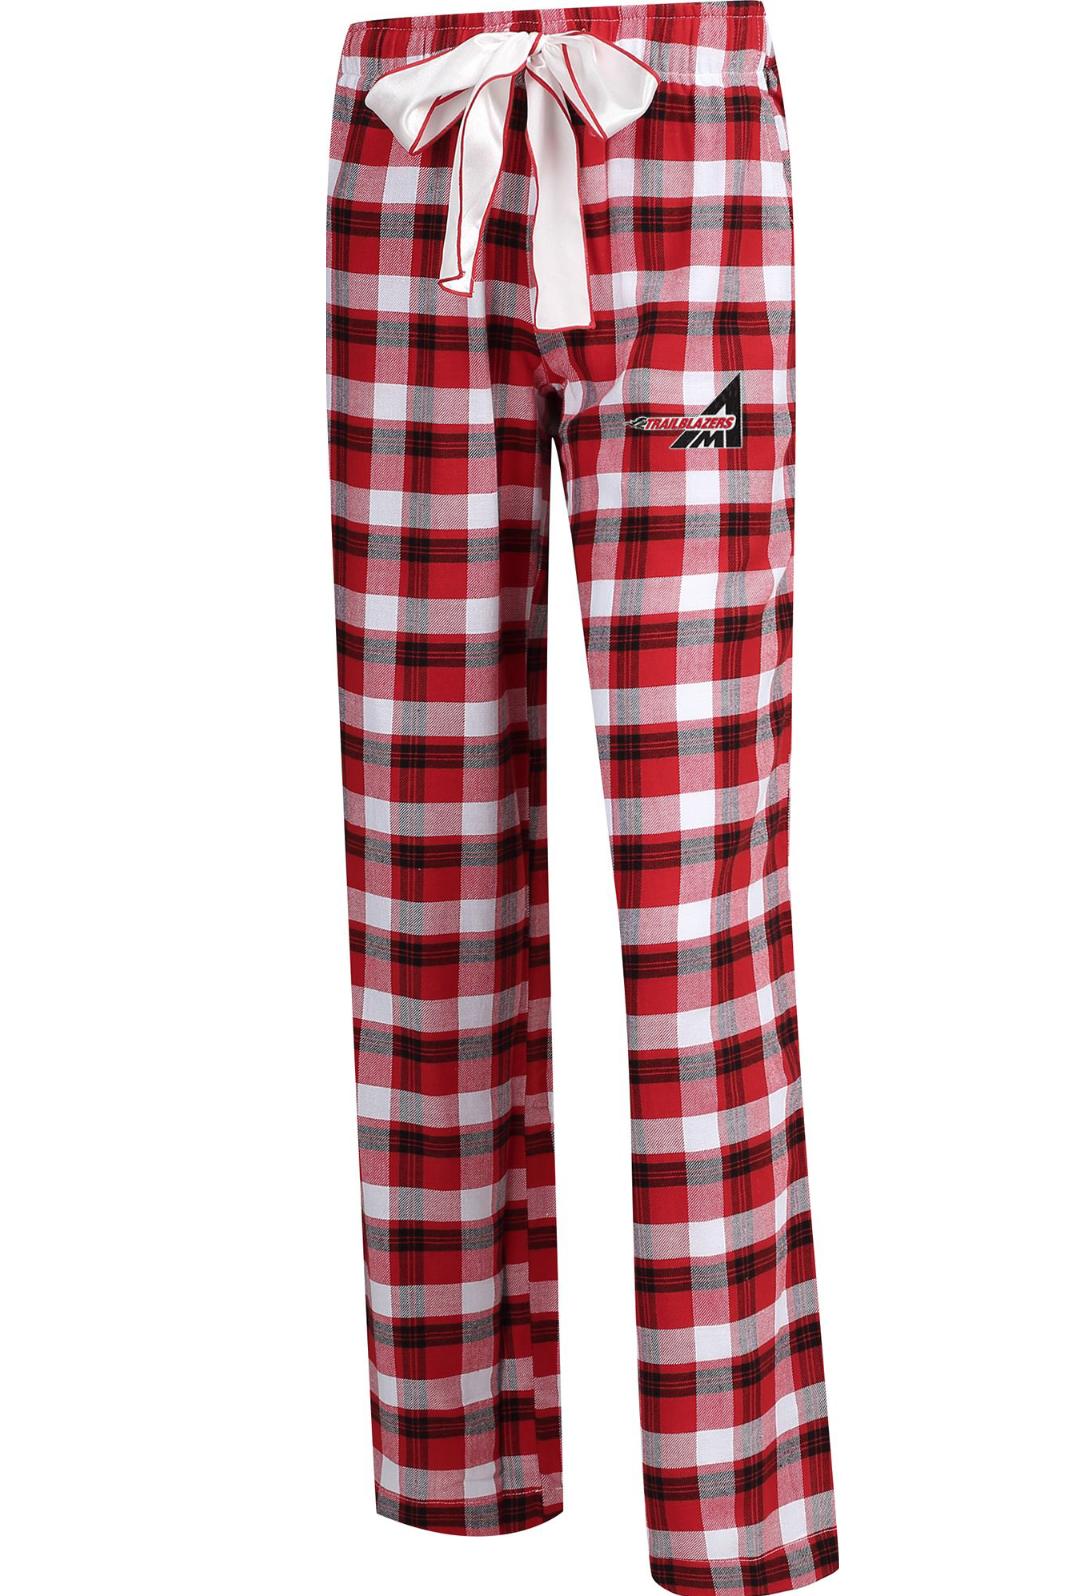 Atlanta Metropolitan State College Trailblazers Women's Checkered Plaid Pant